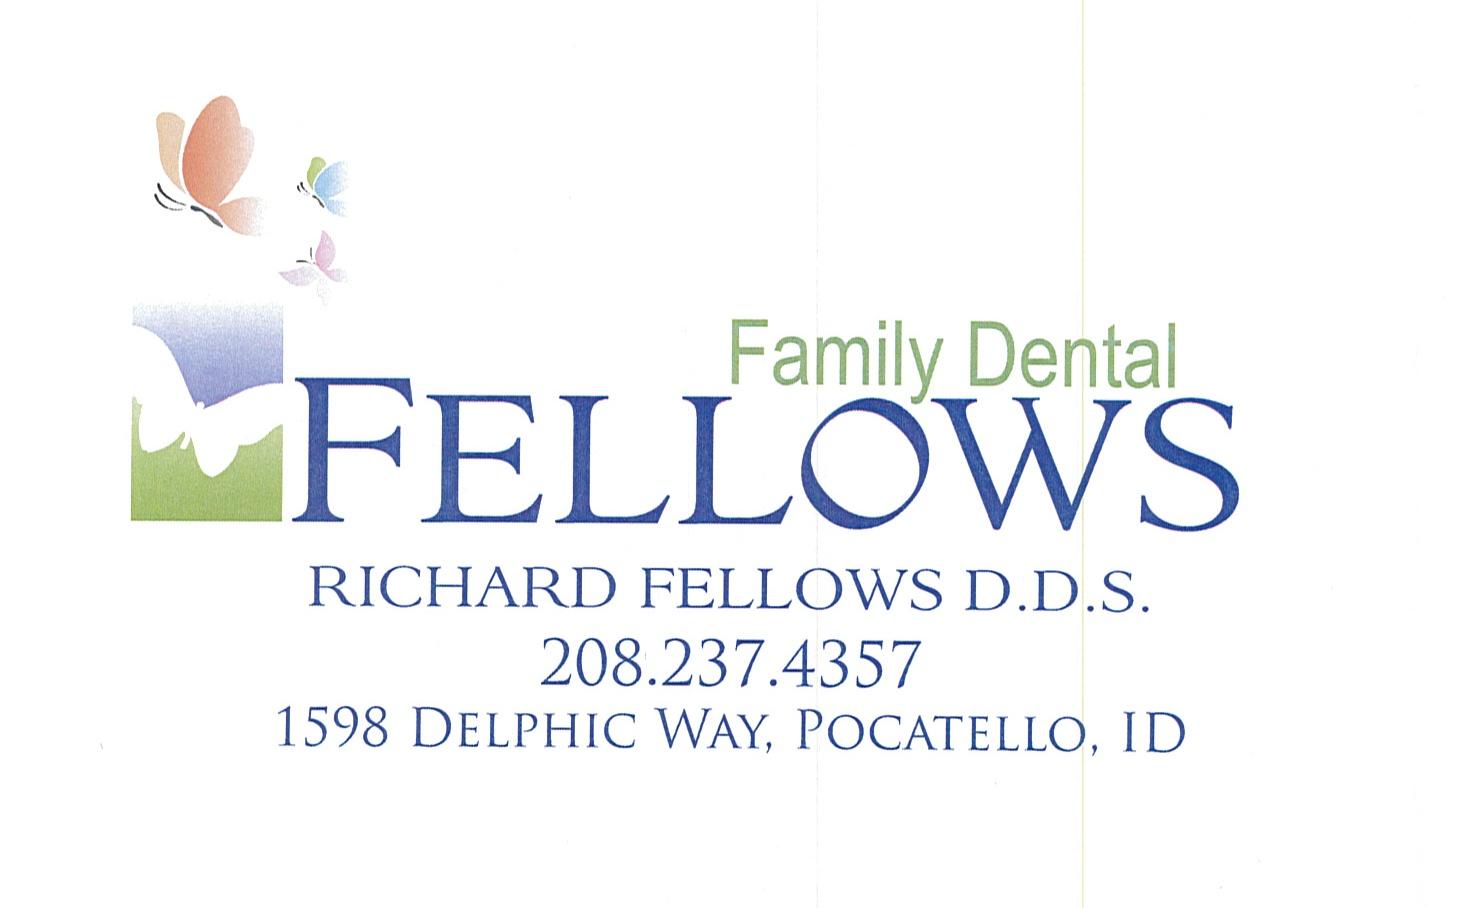 Fellows Family Dental